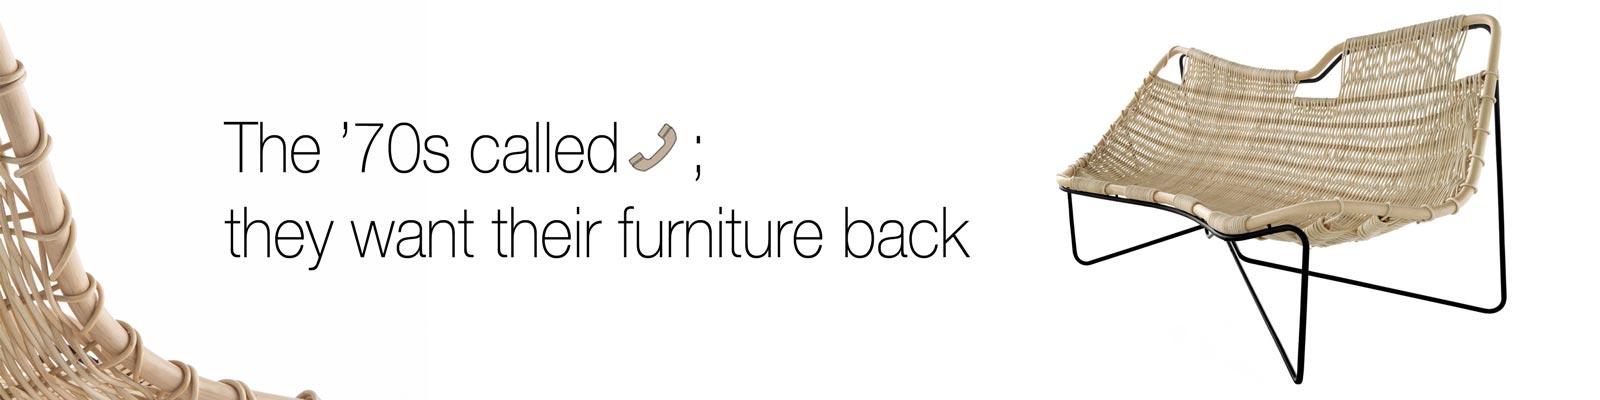 Furniture for the Algarve 1